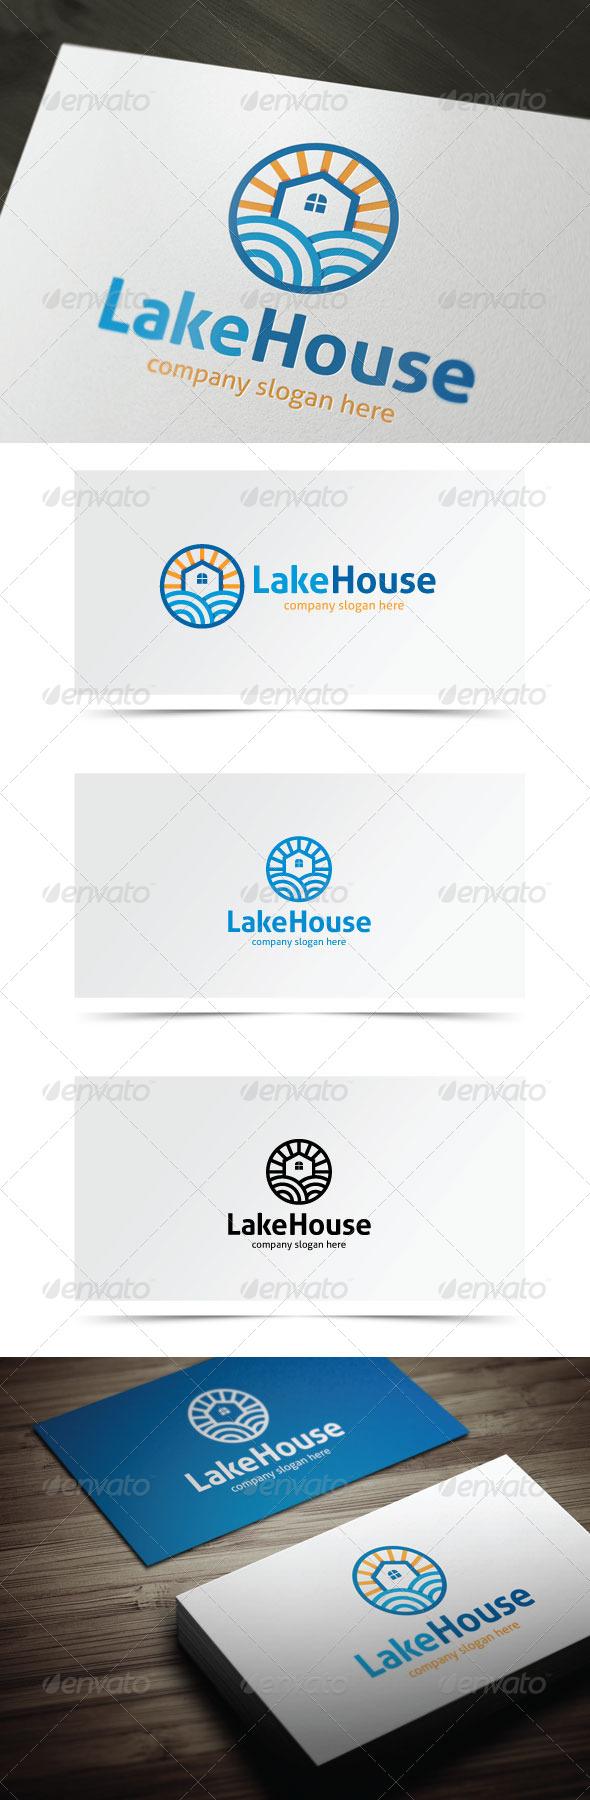 GraphicRiver Lake House 6905615